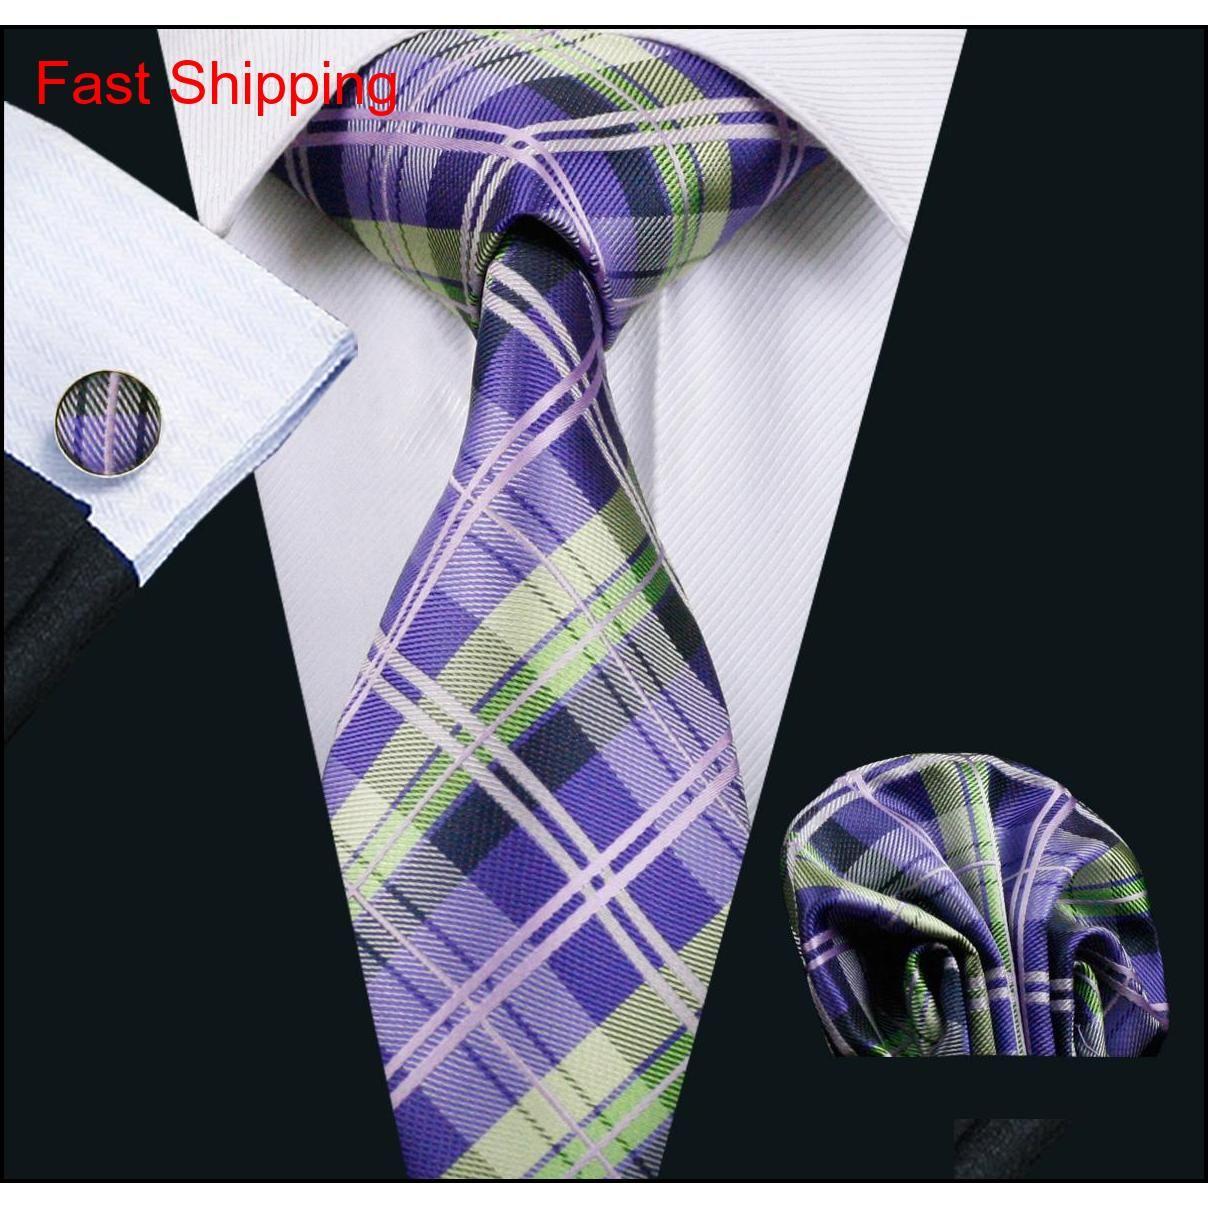 Lila Check Herren Krawatten Seide Hanky Manschettenknöpfe Krawatte Set Jacquard gewebt Business Formale Bussiness Casual Tie Mee Qylkmu Homes2007